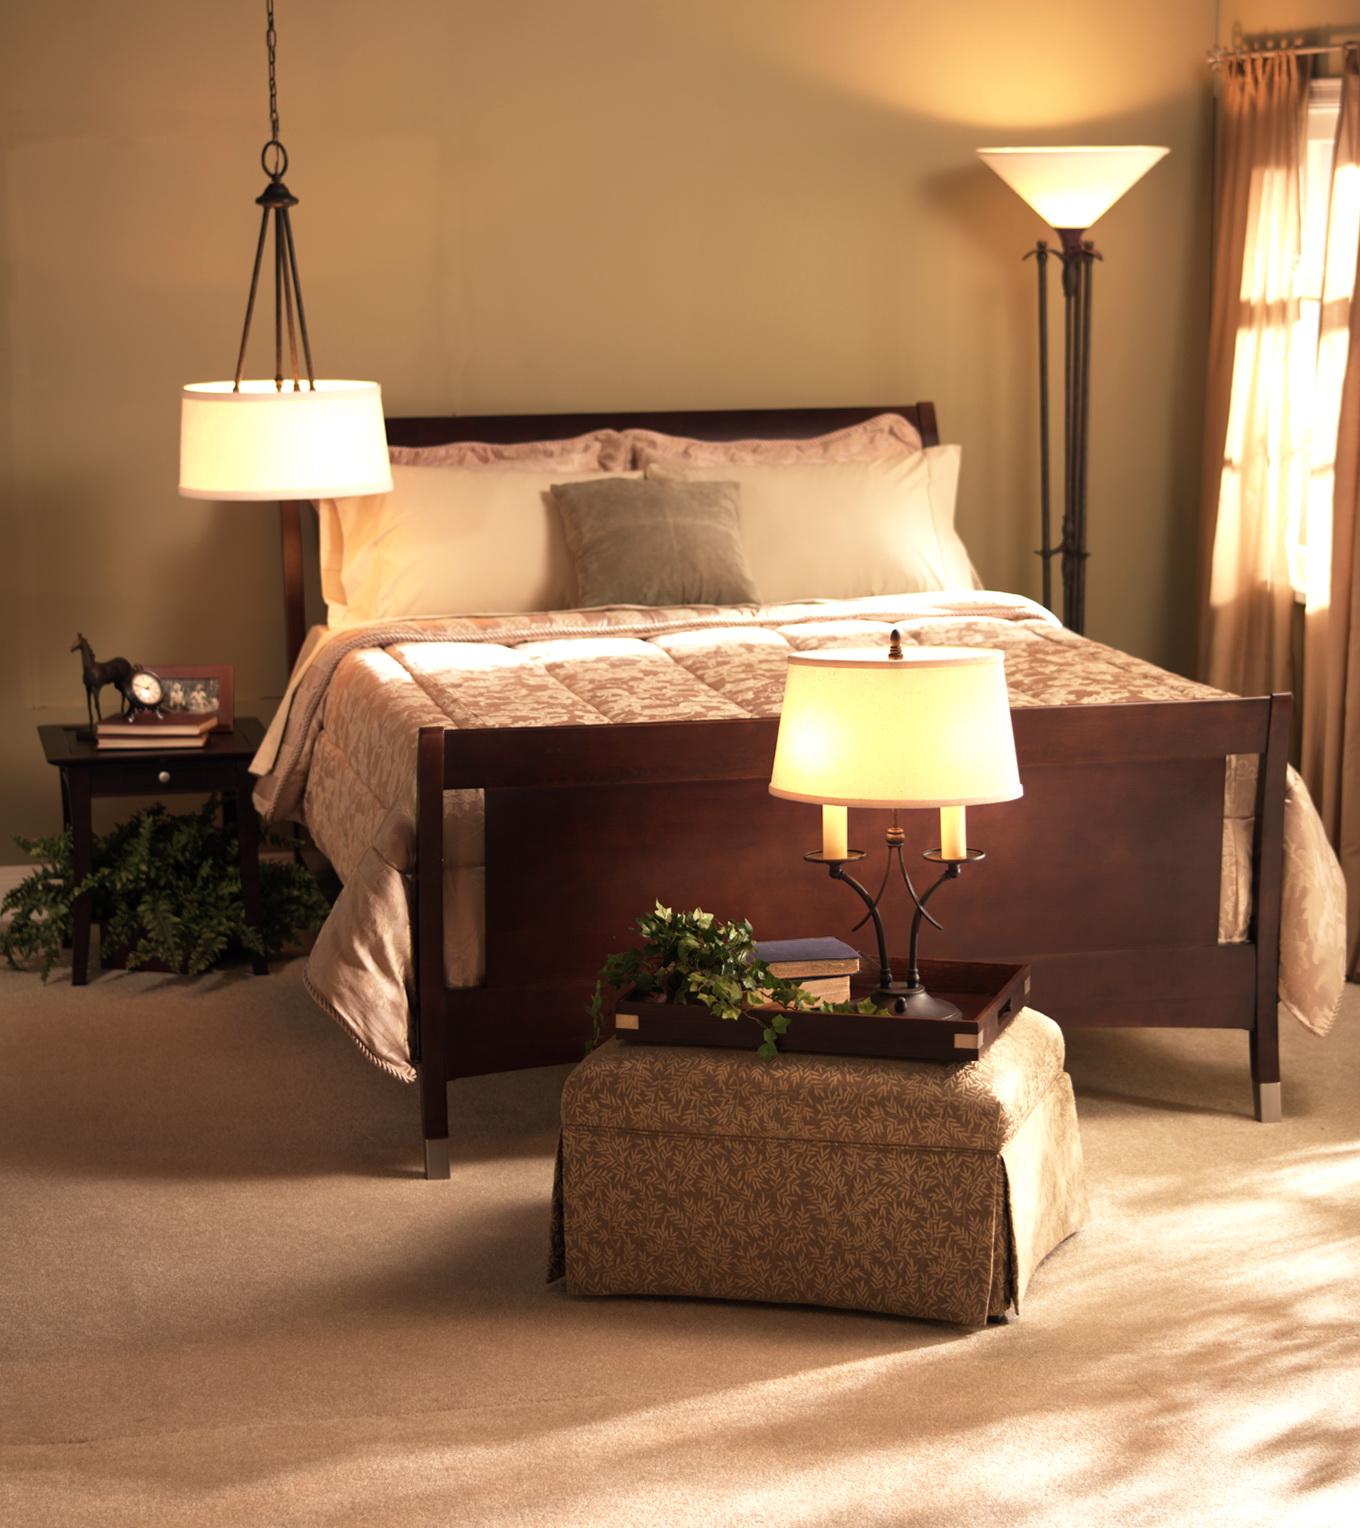 Chandelier in bedroom ideas home design ideas for Bedroom chandelier ideas